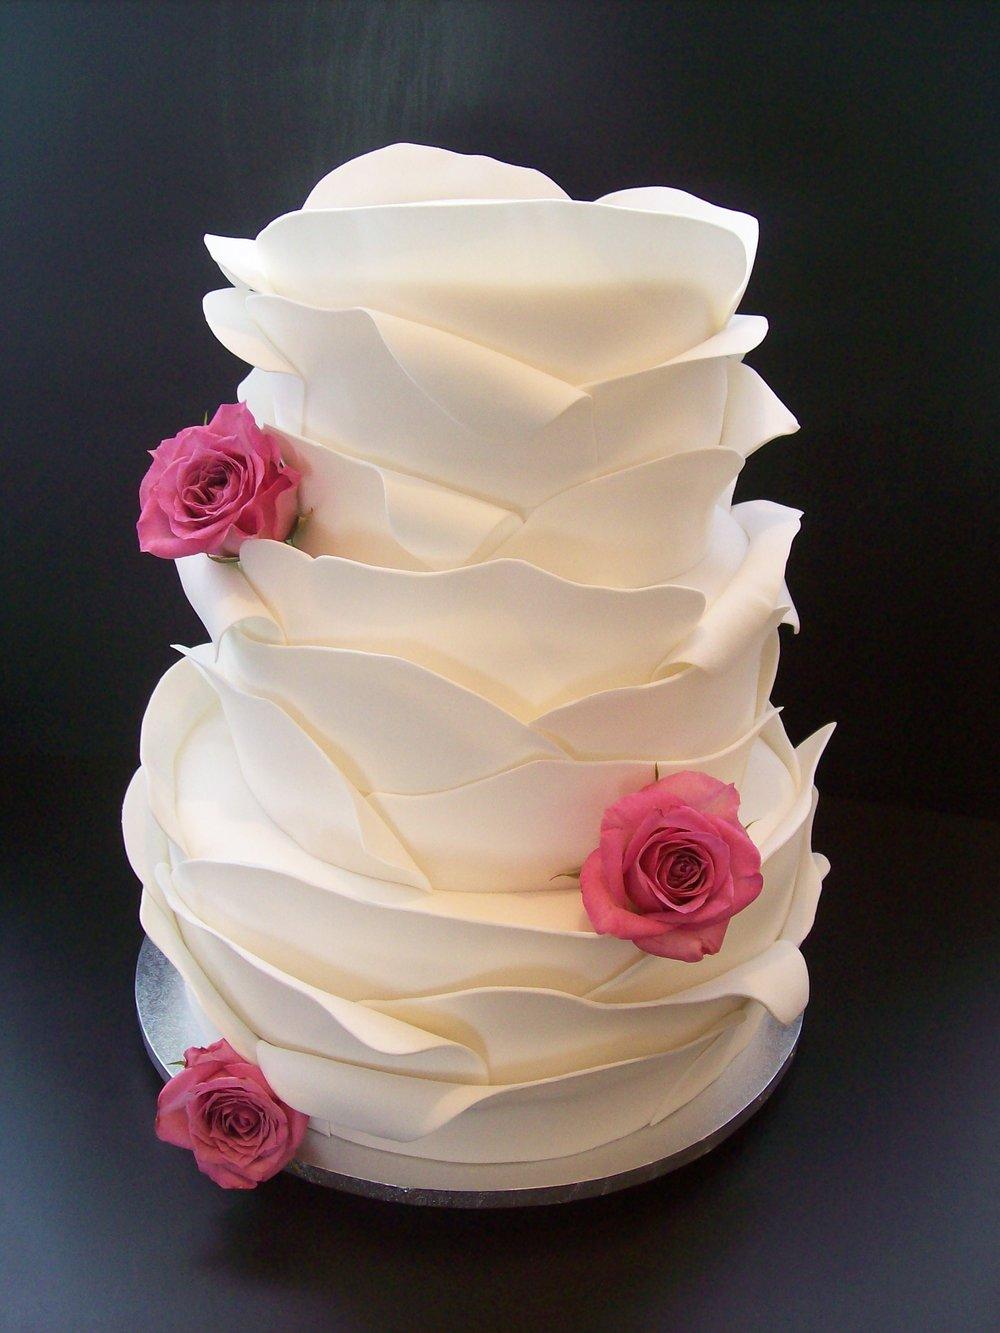 Temptation Cakes -